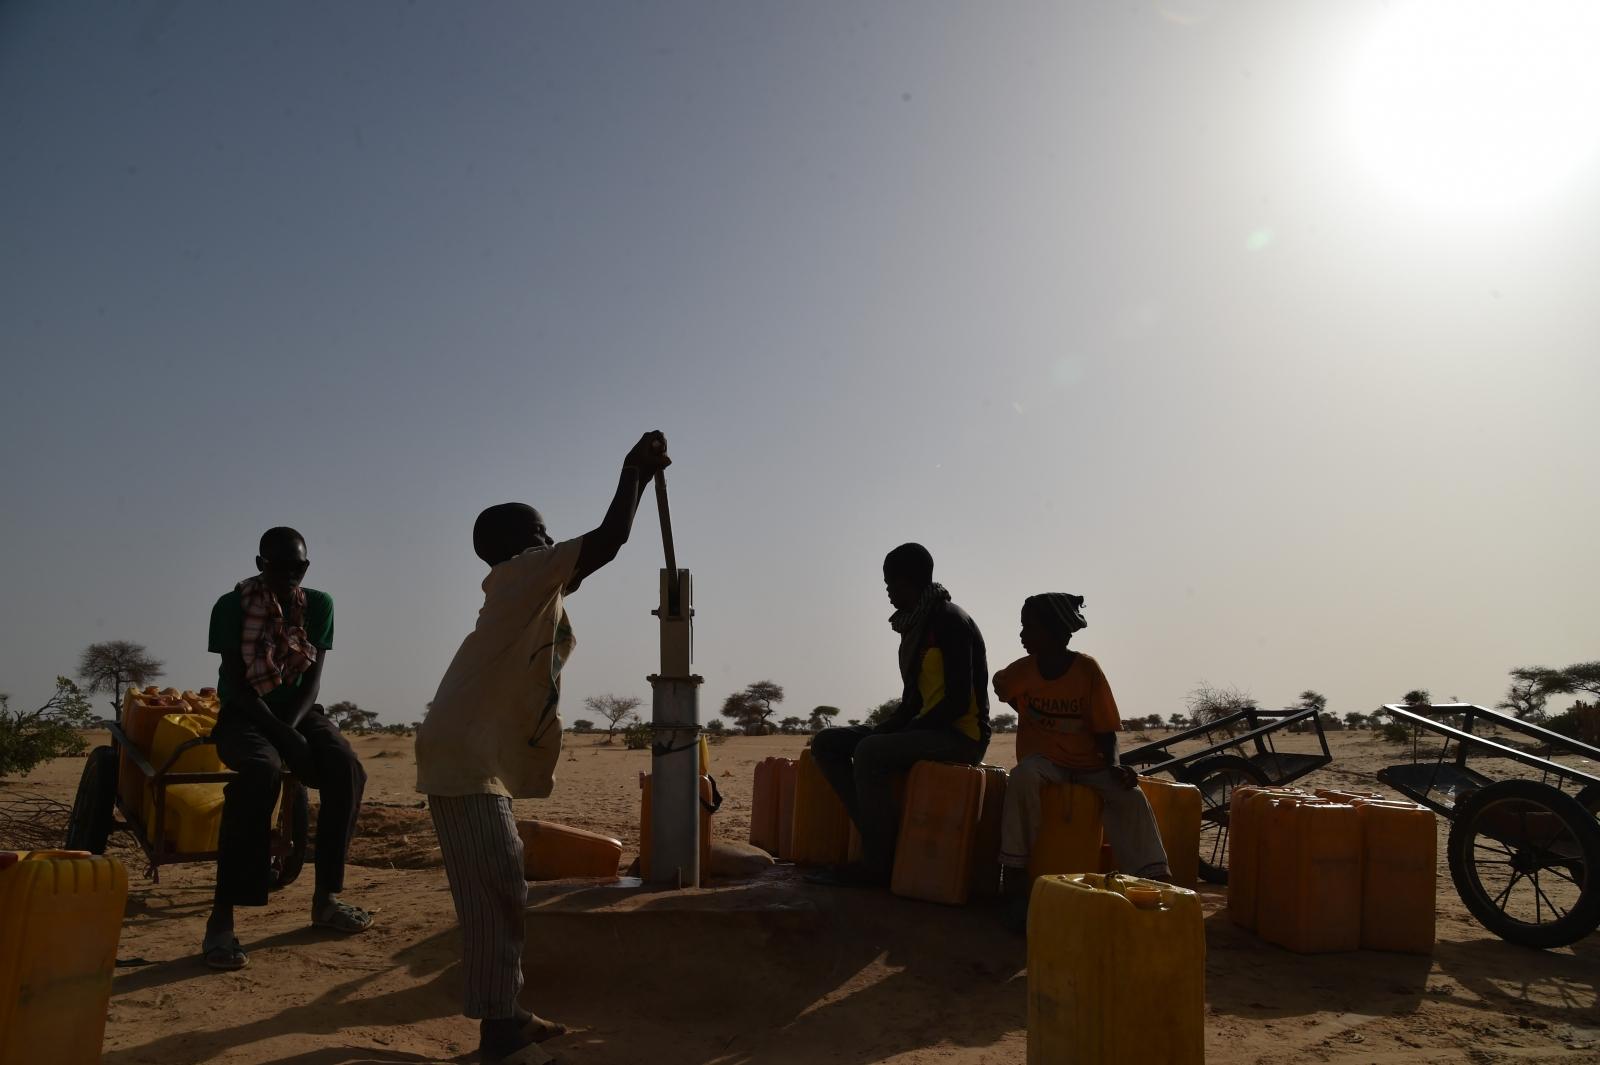 Nigerian refugees